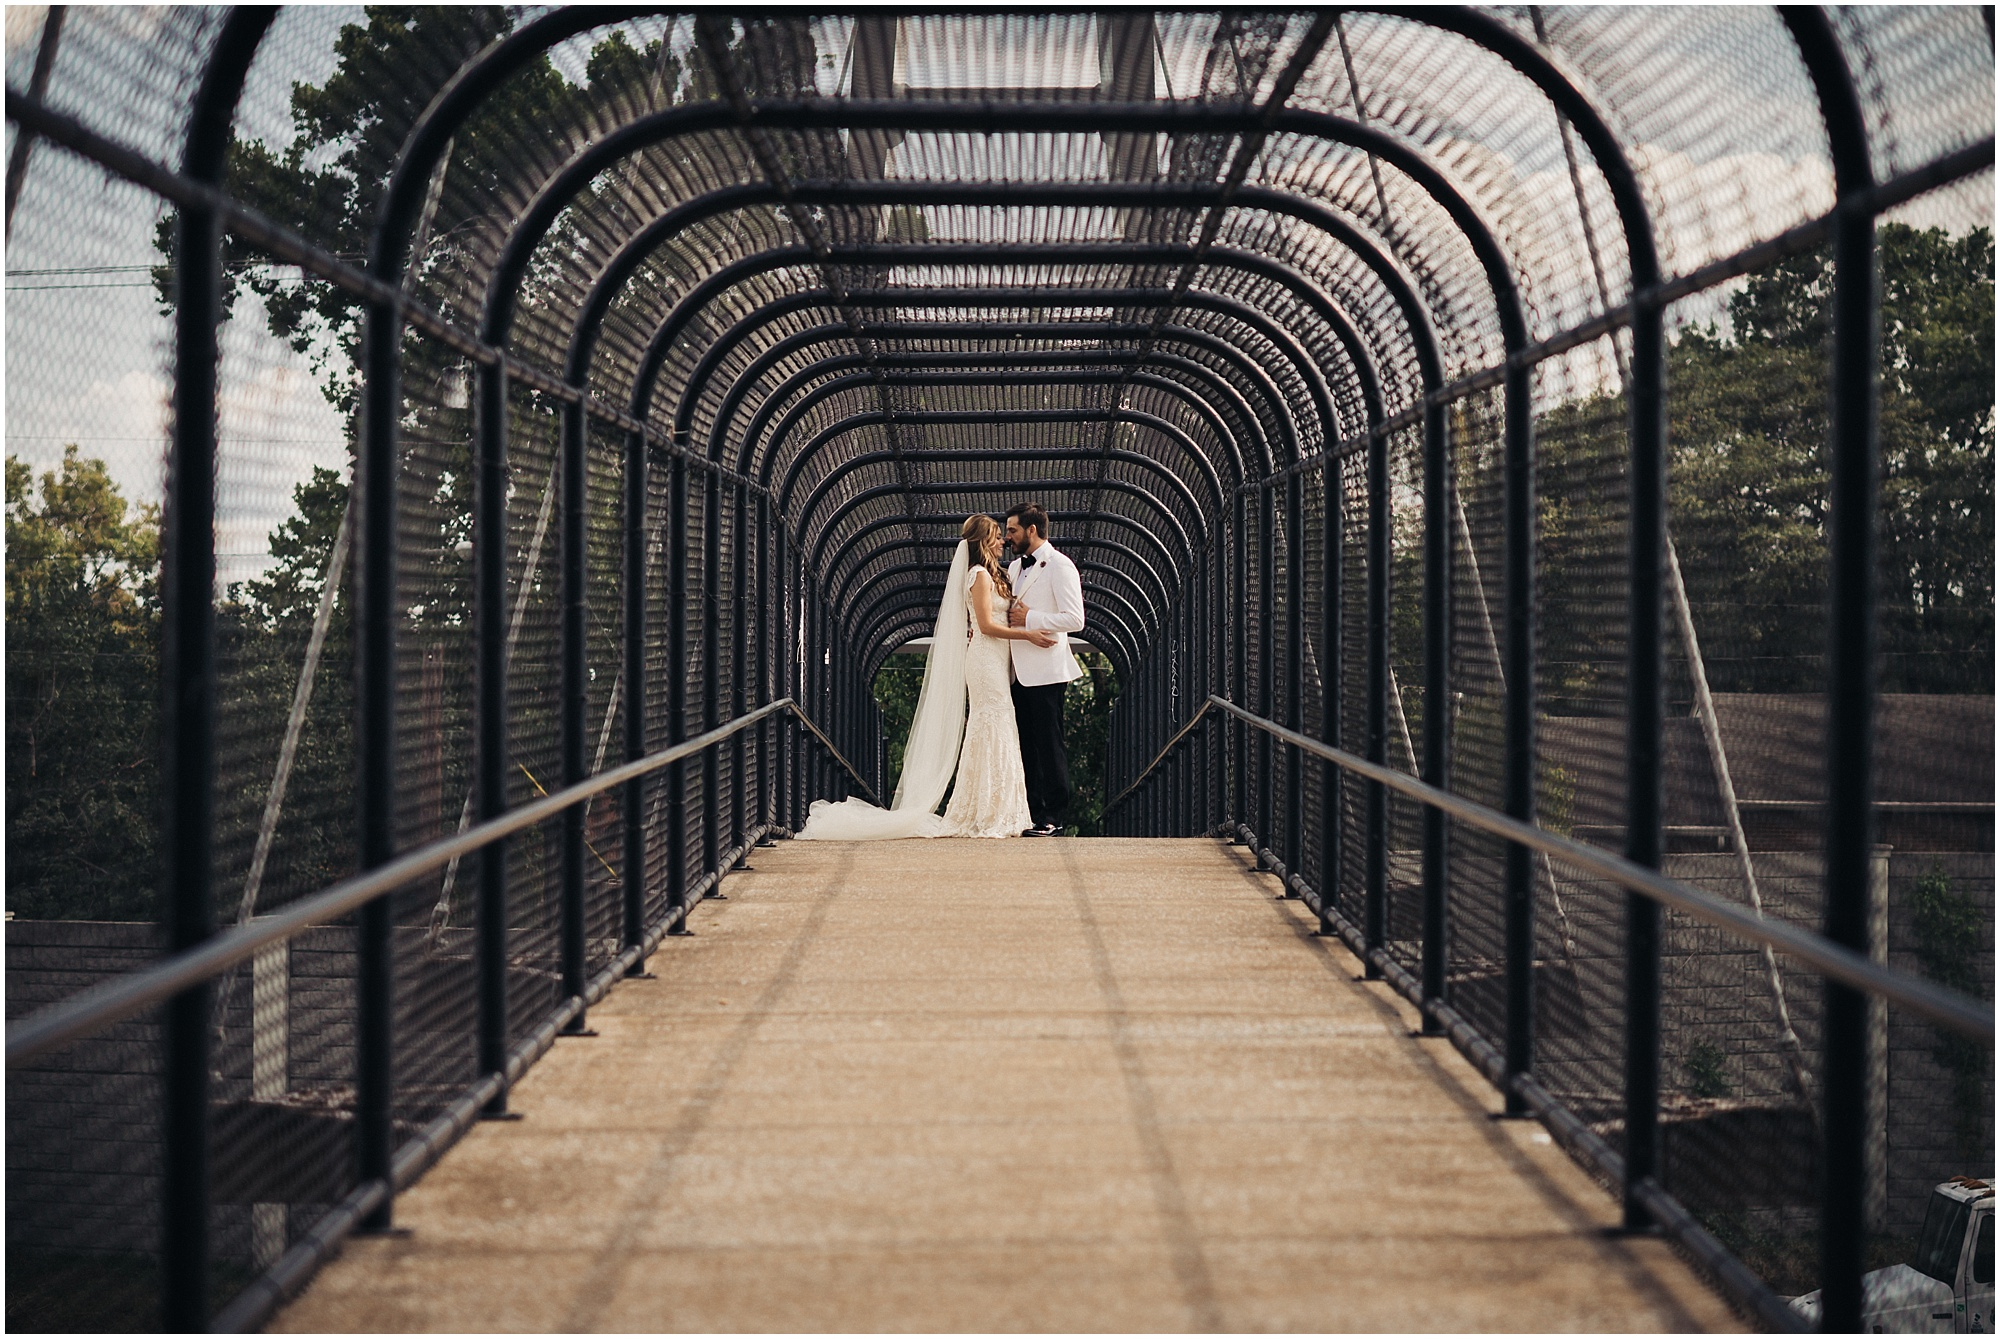 Urban bridge wedding portrait